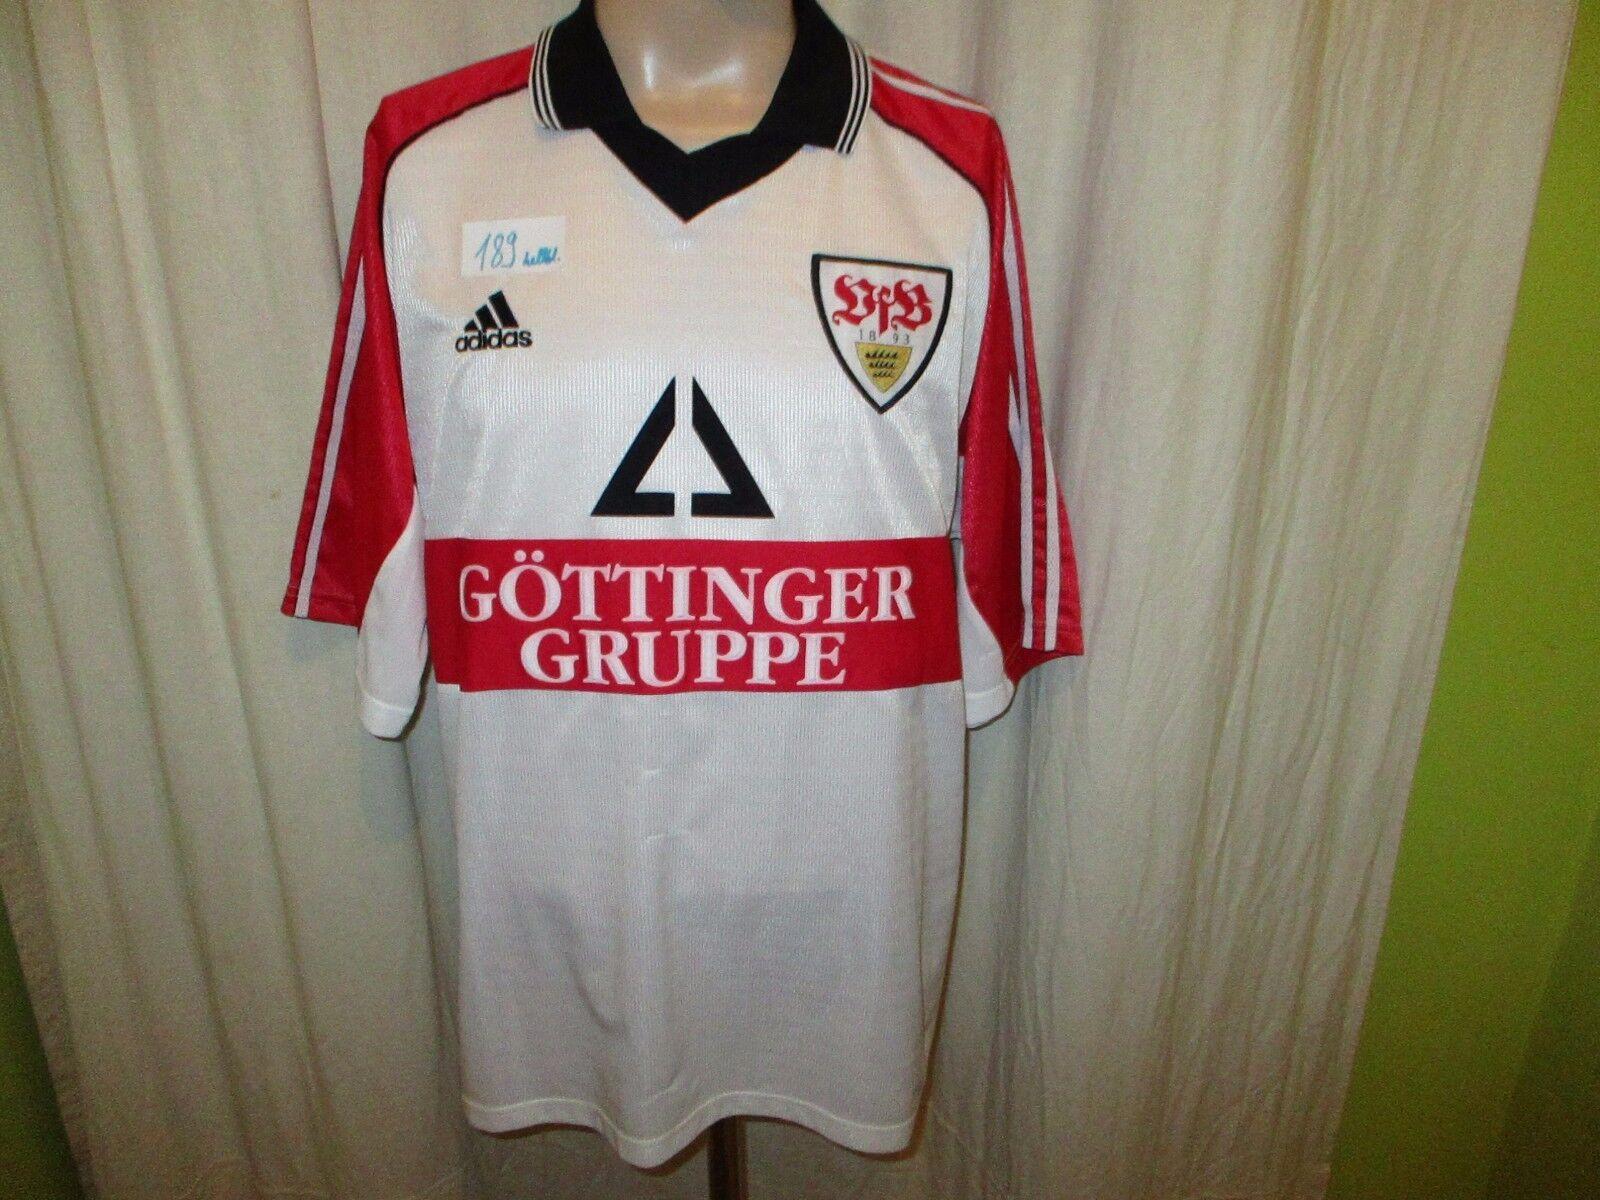 VfB Stuttgart Adidas Trikot 1998 99    Göttinger Gruppe  + Nr.8 Zeyer Gr.XL TOP    Realistisch  0239fb